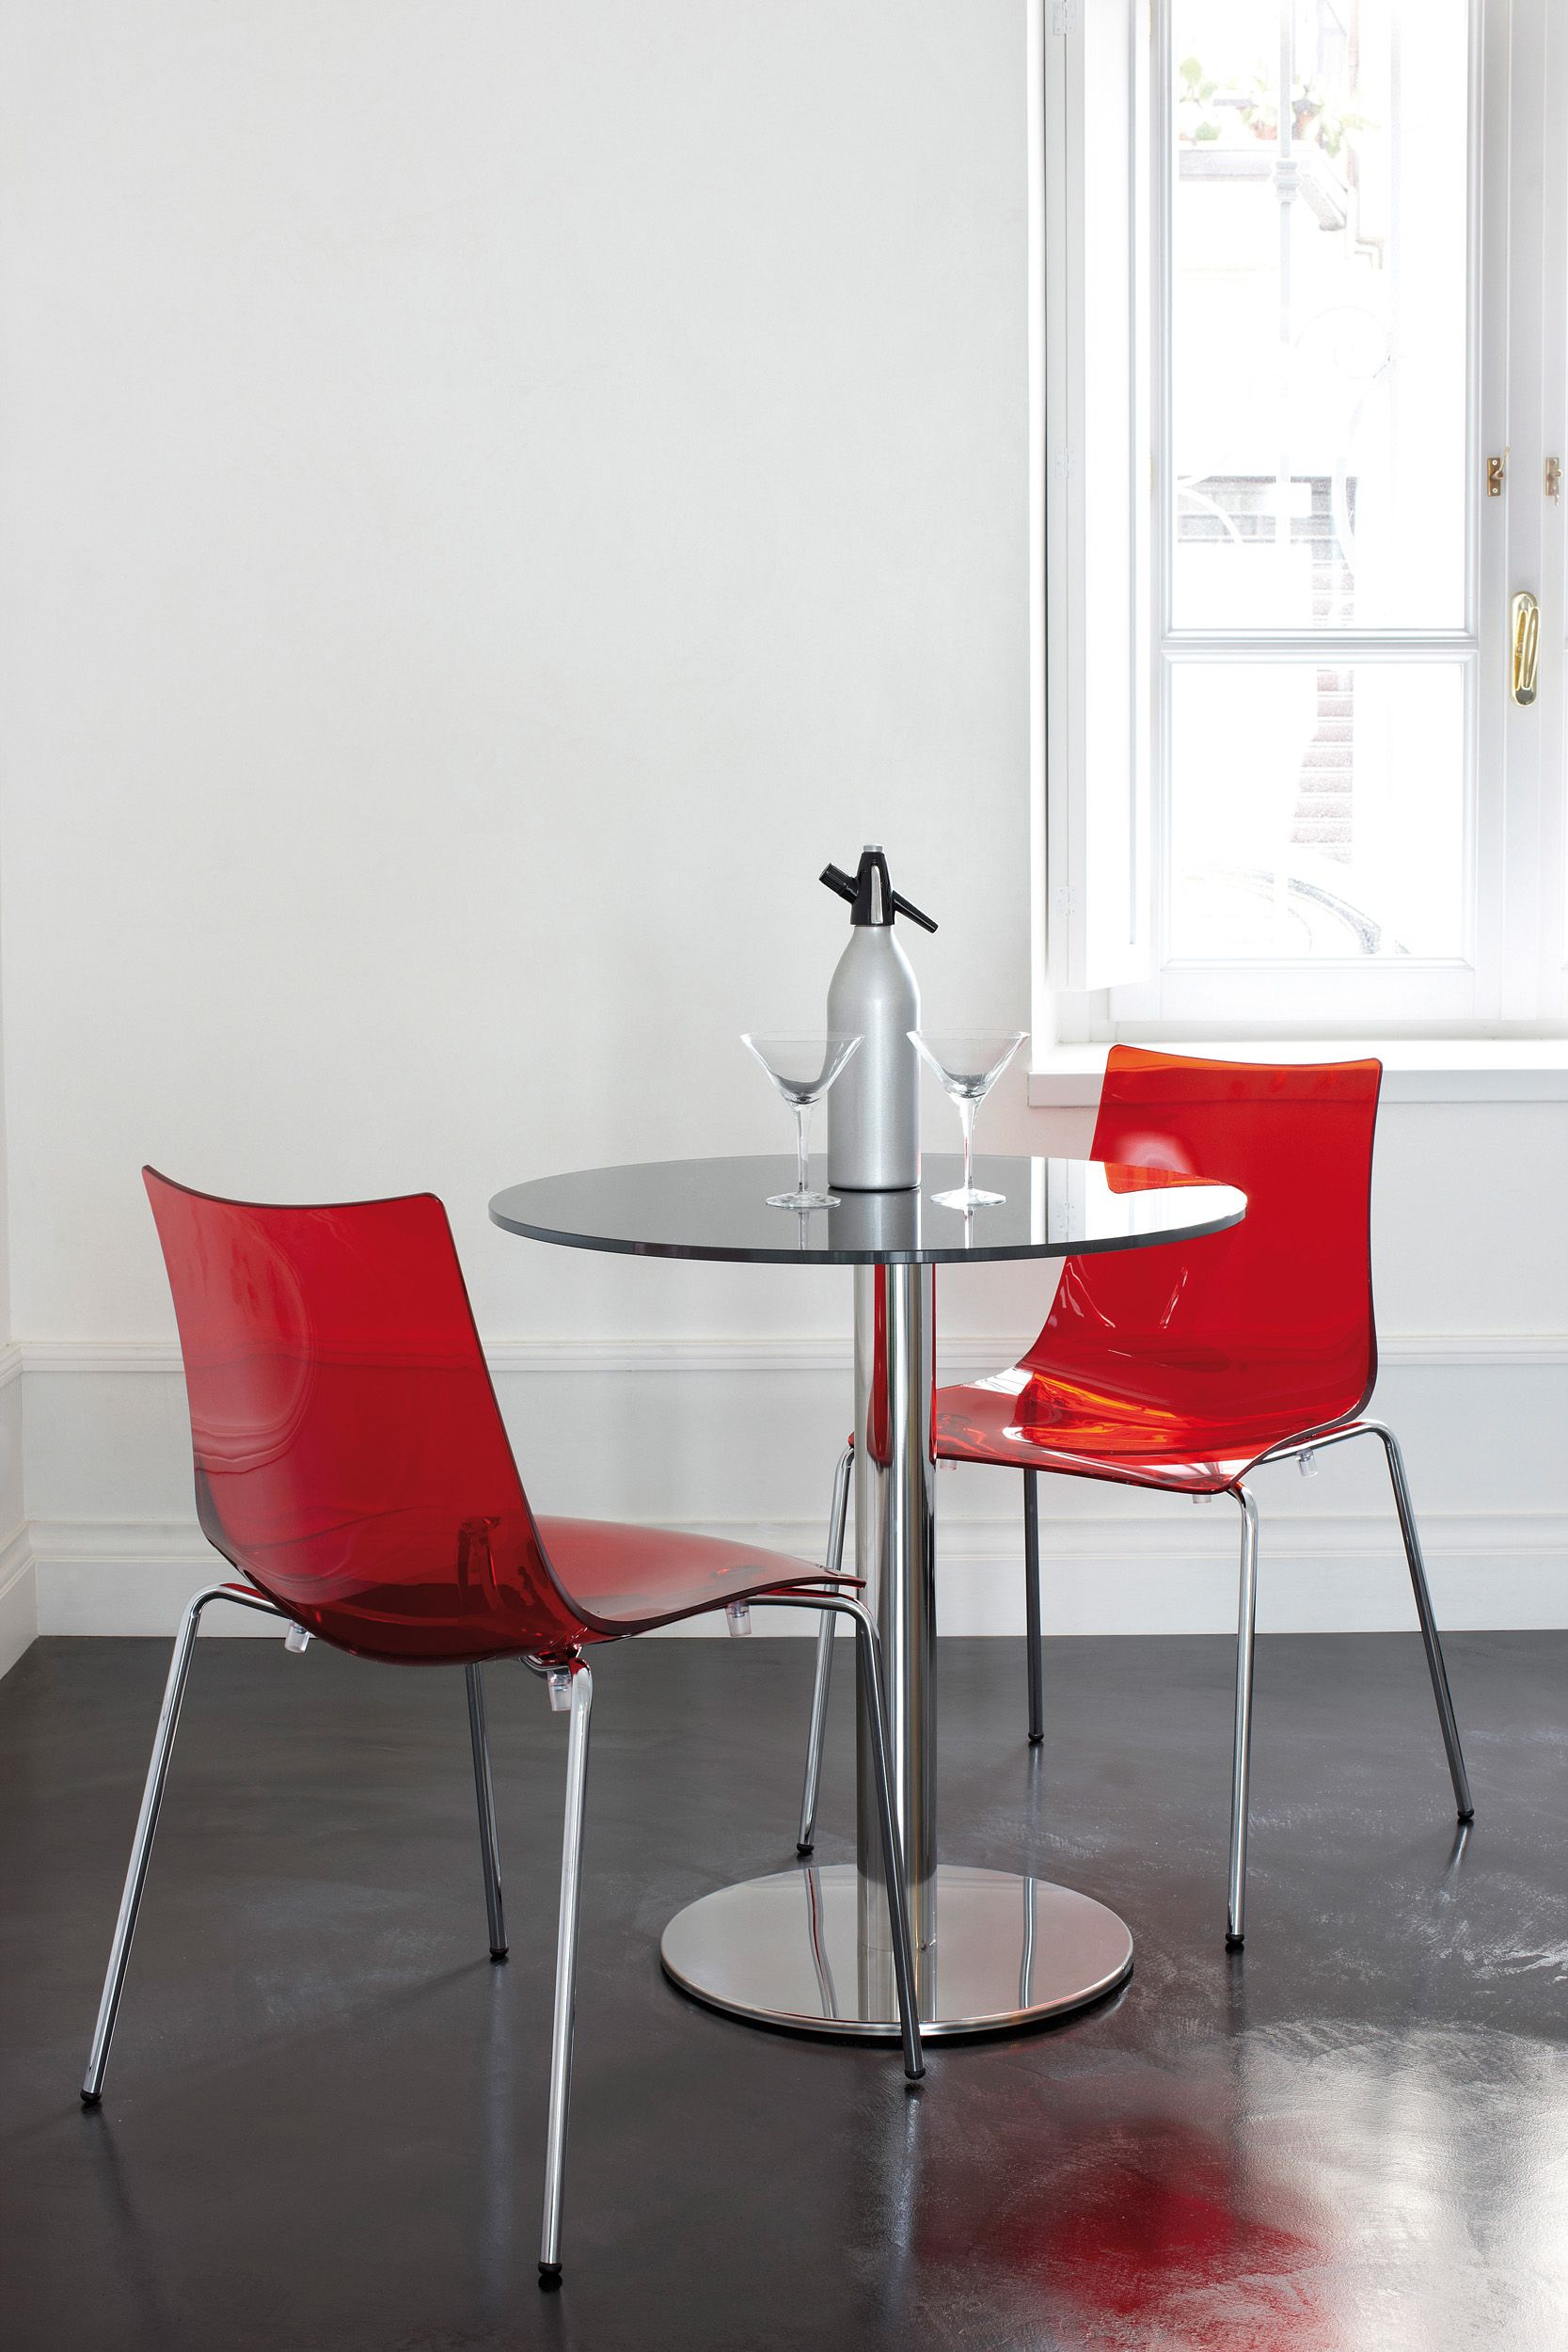 Tiffany Glass SCAB Design